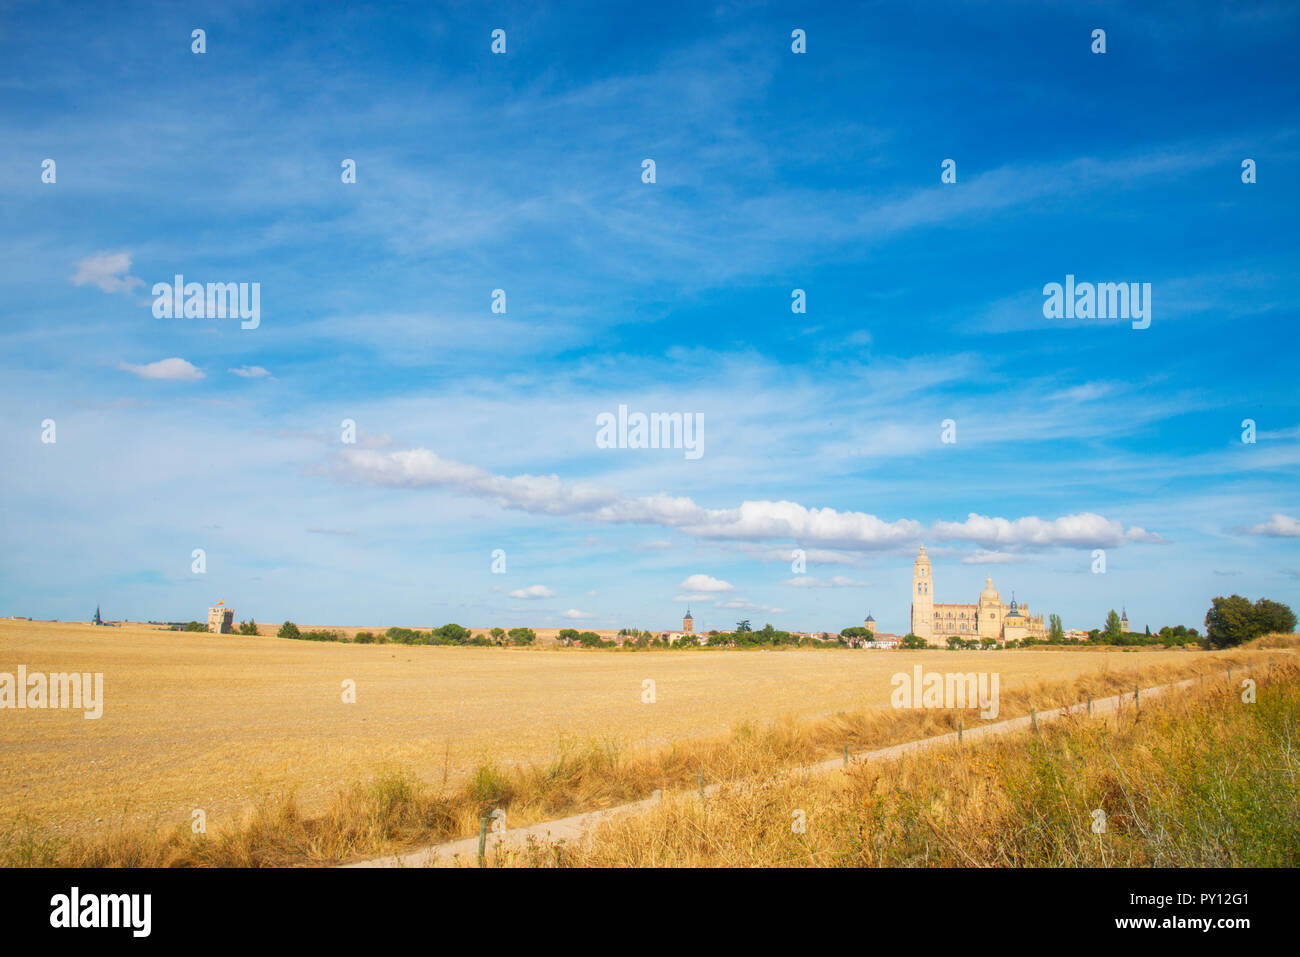 Panoramic view of the city emerging over the horizon. Segovia, Spain. - Stock Image